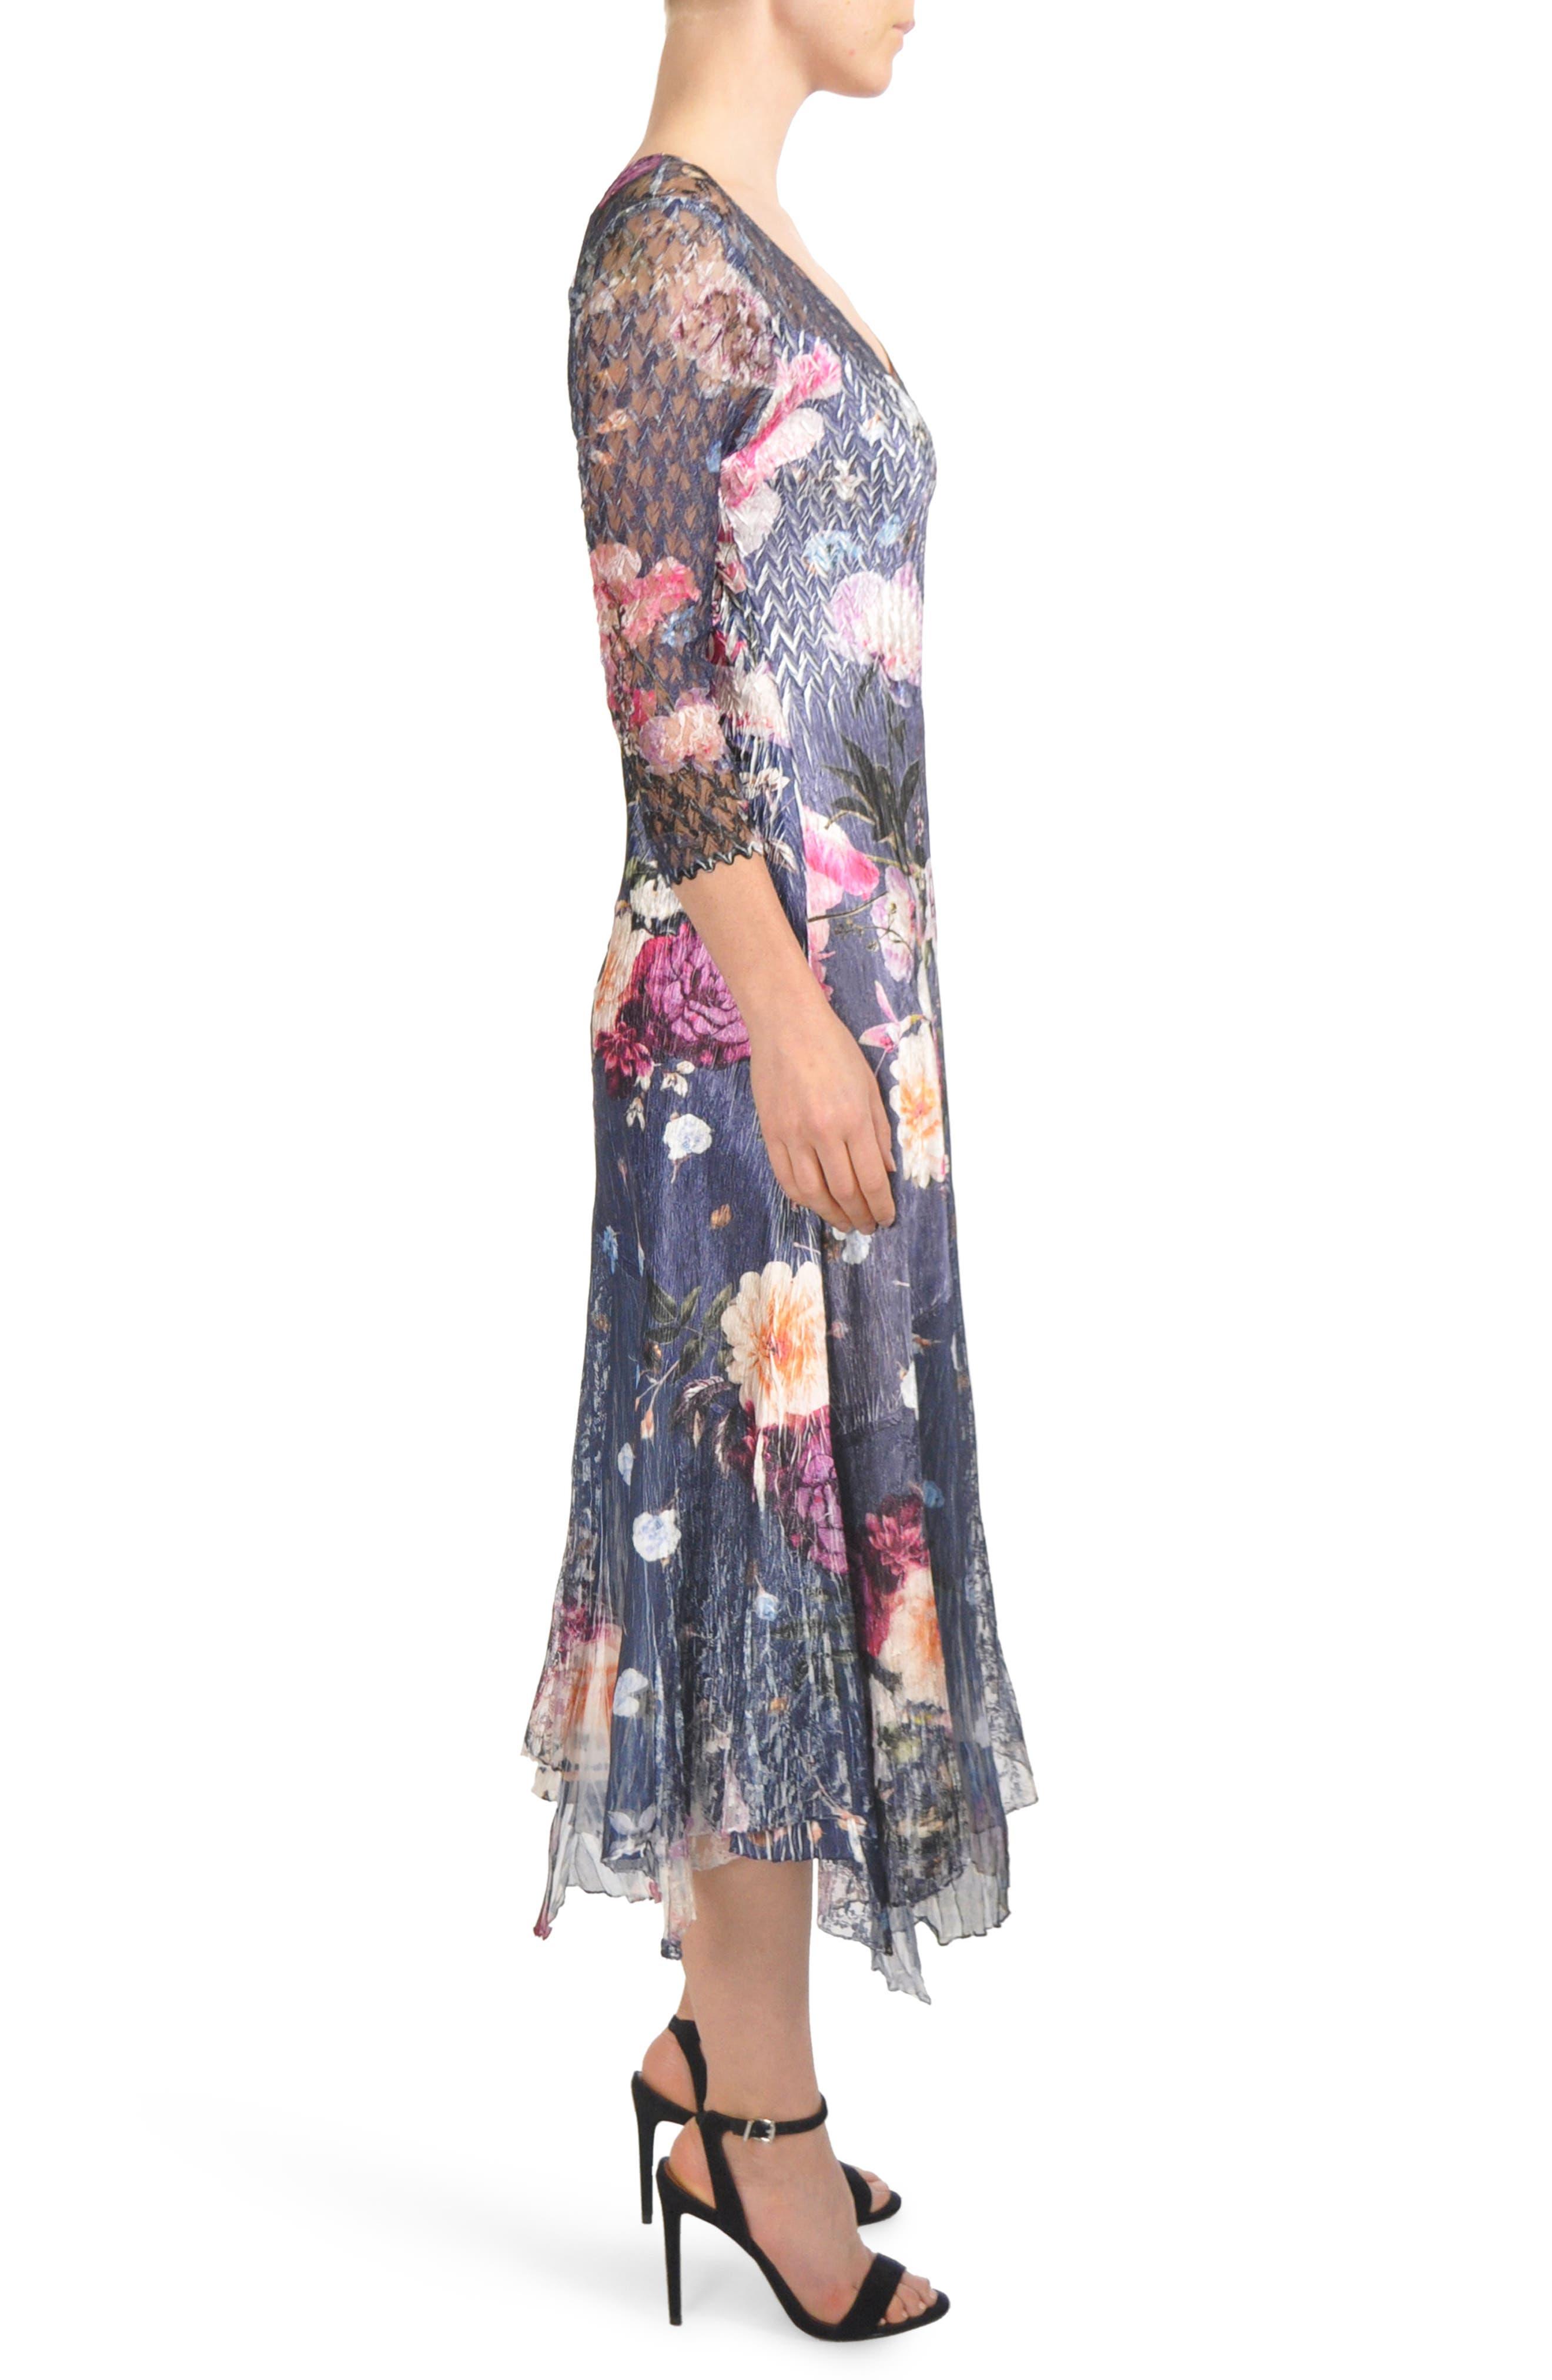 Foral Print Lace Inset Dress,                             Alternate thumbnail 3, color,                             401